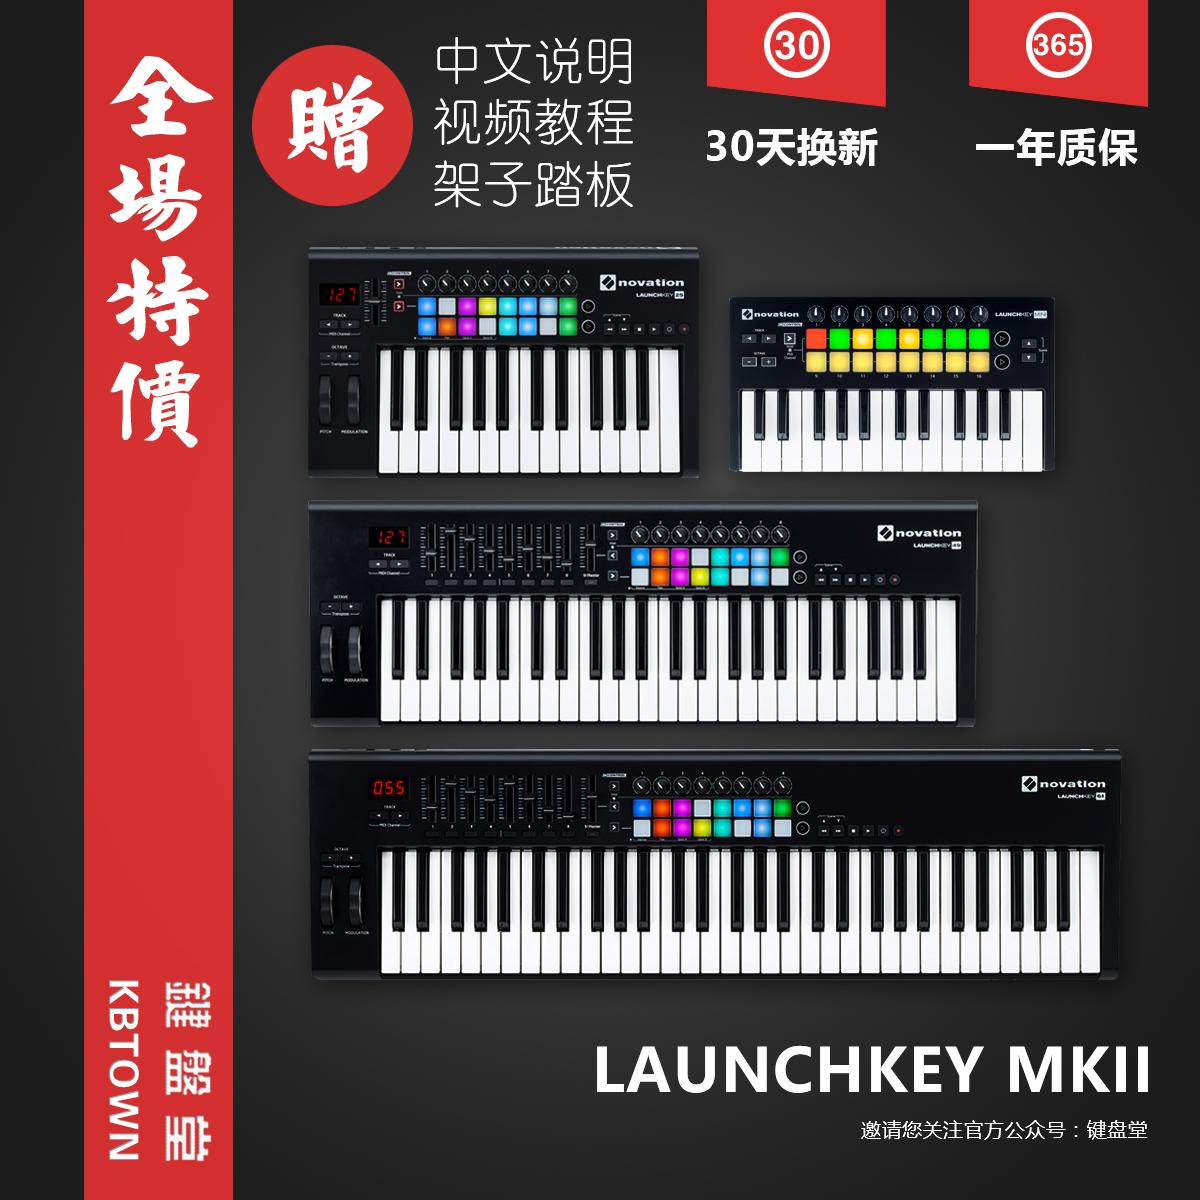 【 клавиатура зал 】 отдавать самолет протектор NOVATION LAUNCHKEY 61/49/25/MINI MK2 MKII